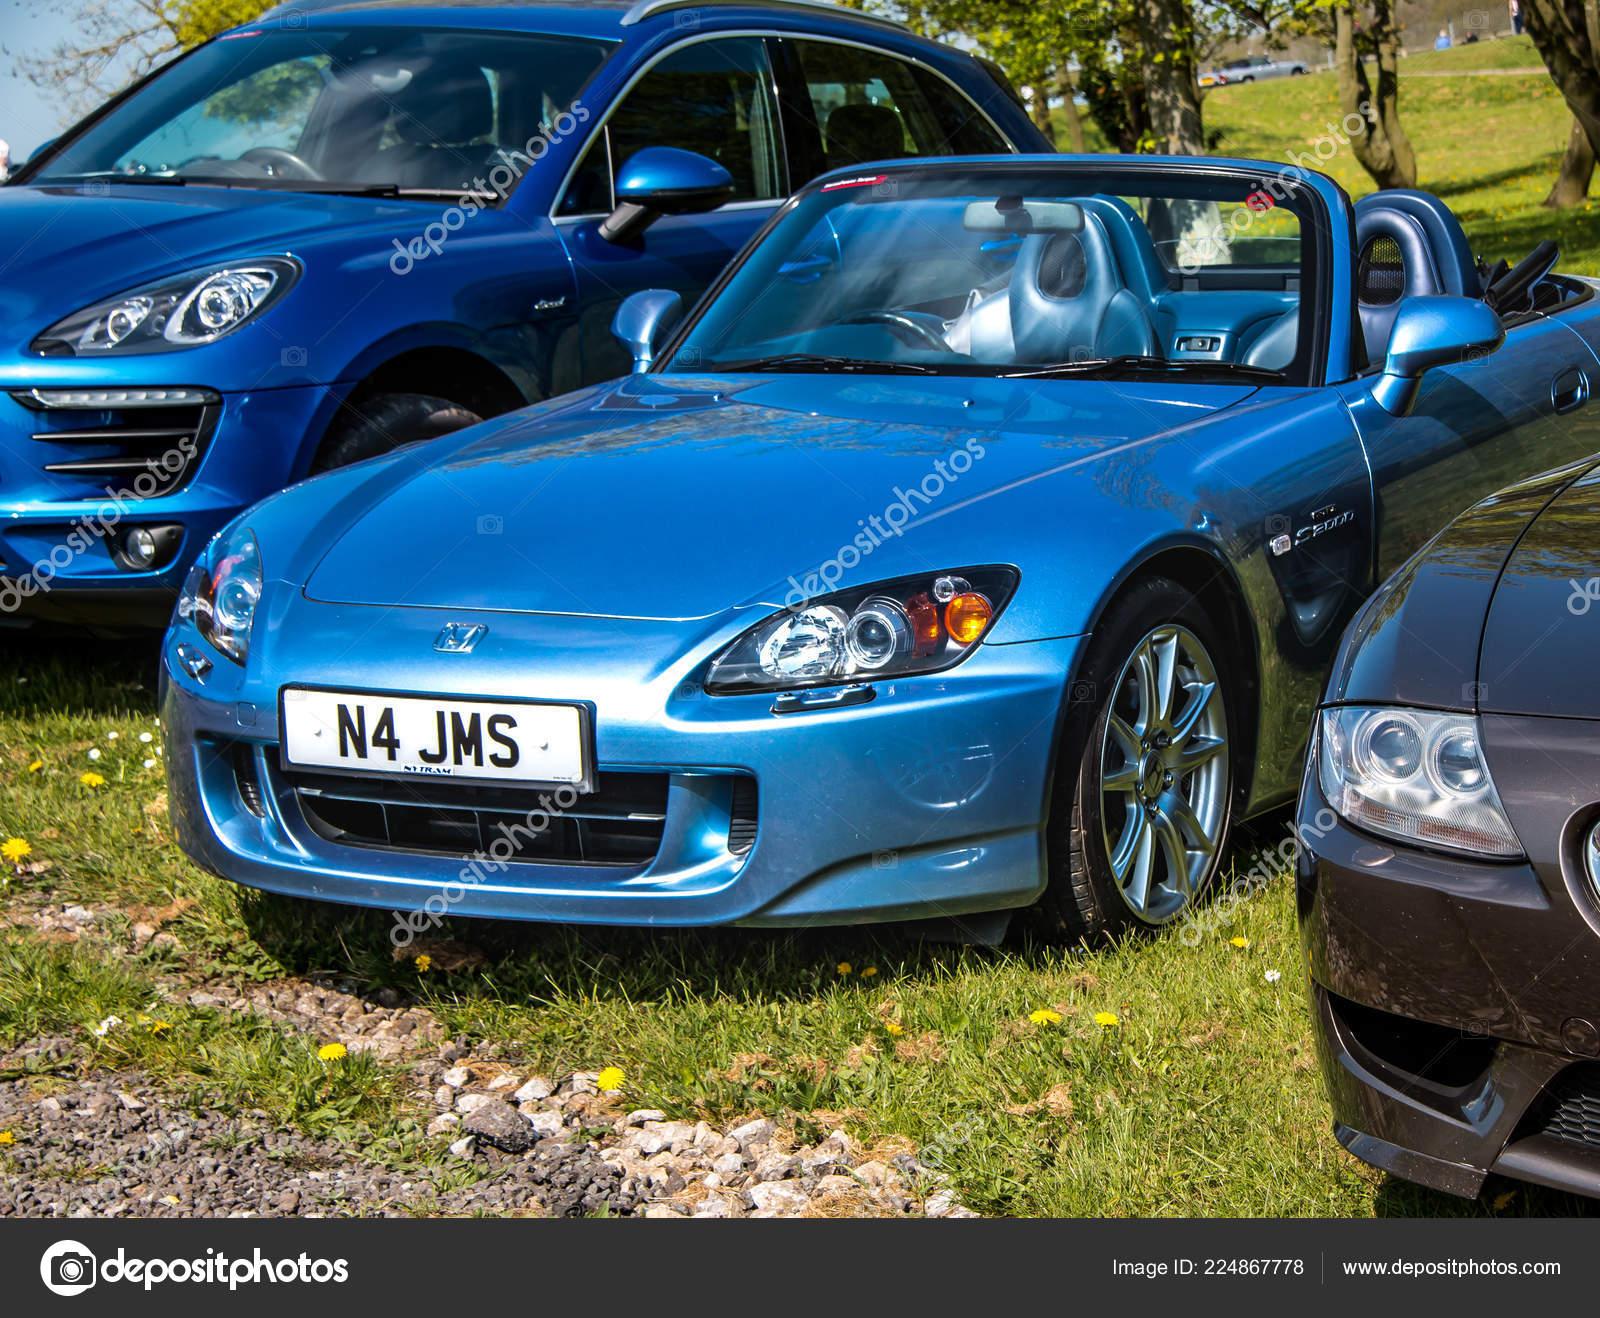 Light Blue Convertible Honda S2000 Sports Car Stock Editorial Photo C Tobyparsons 224867778